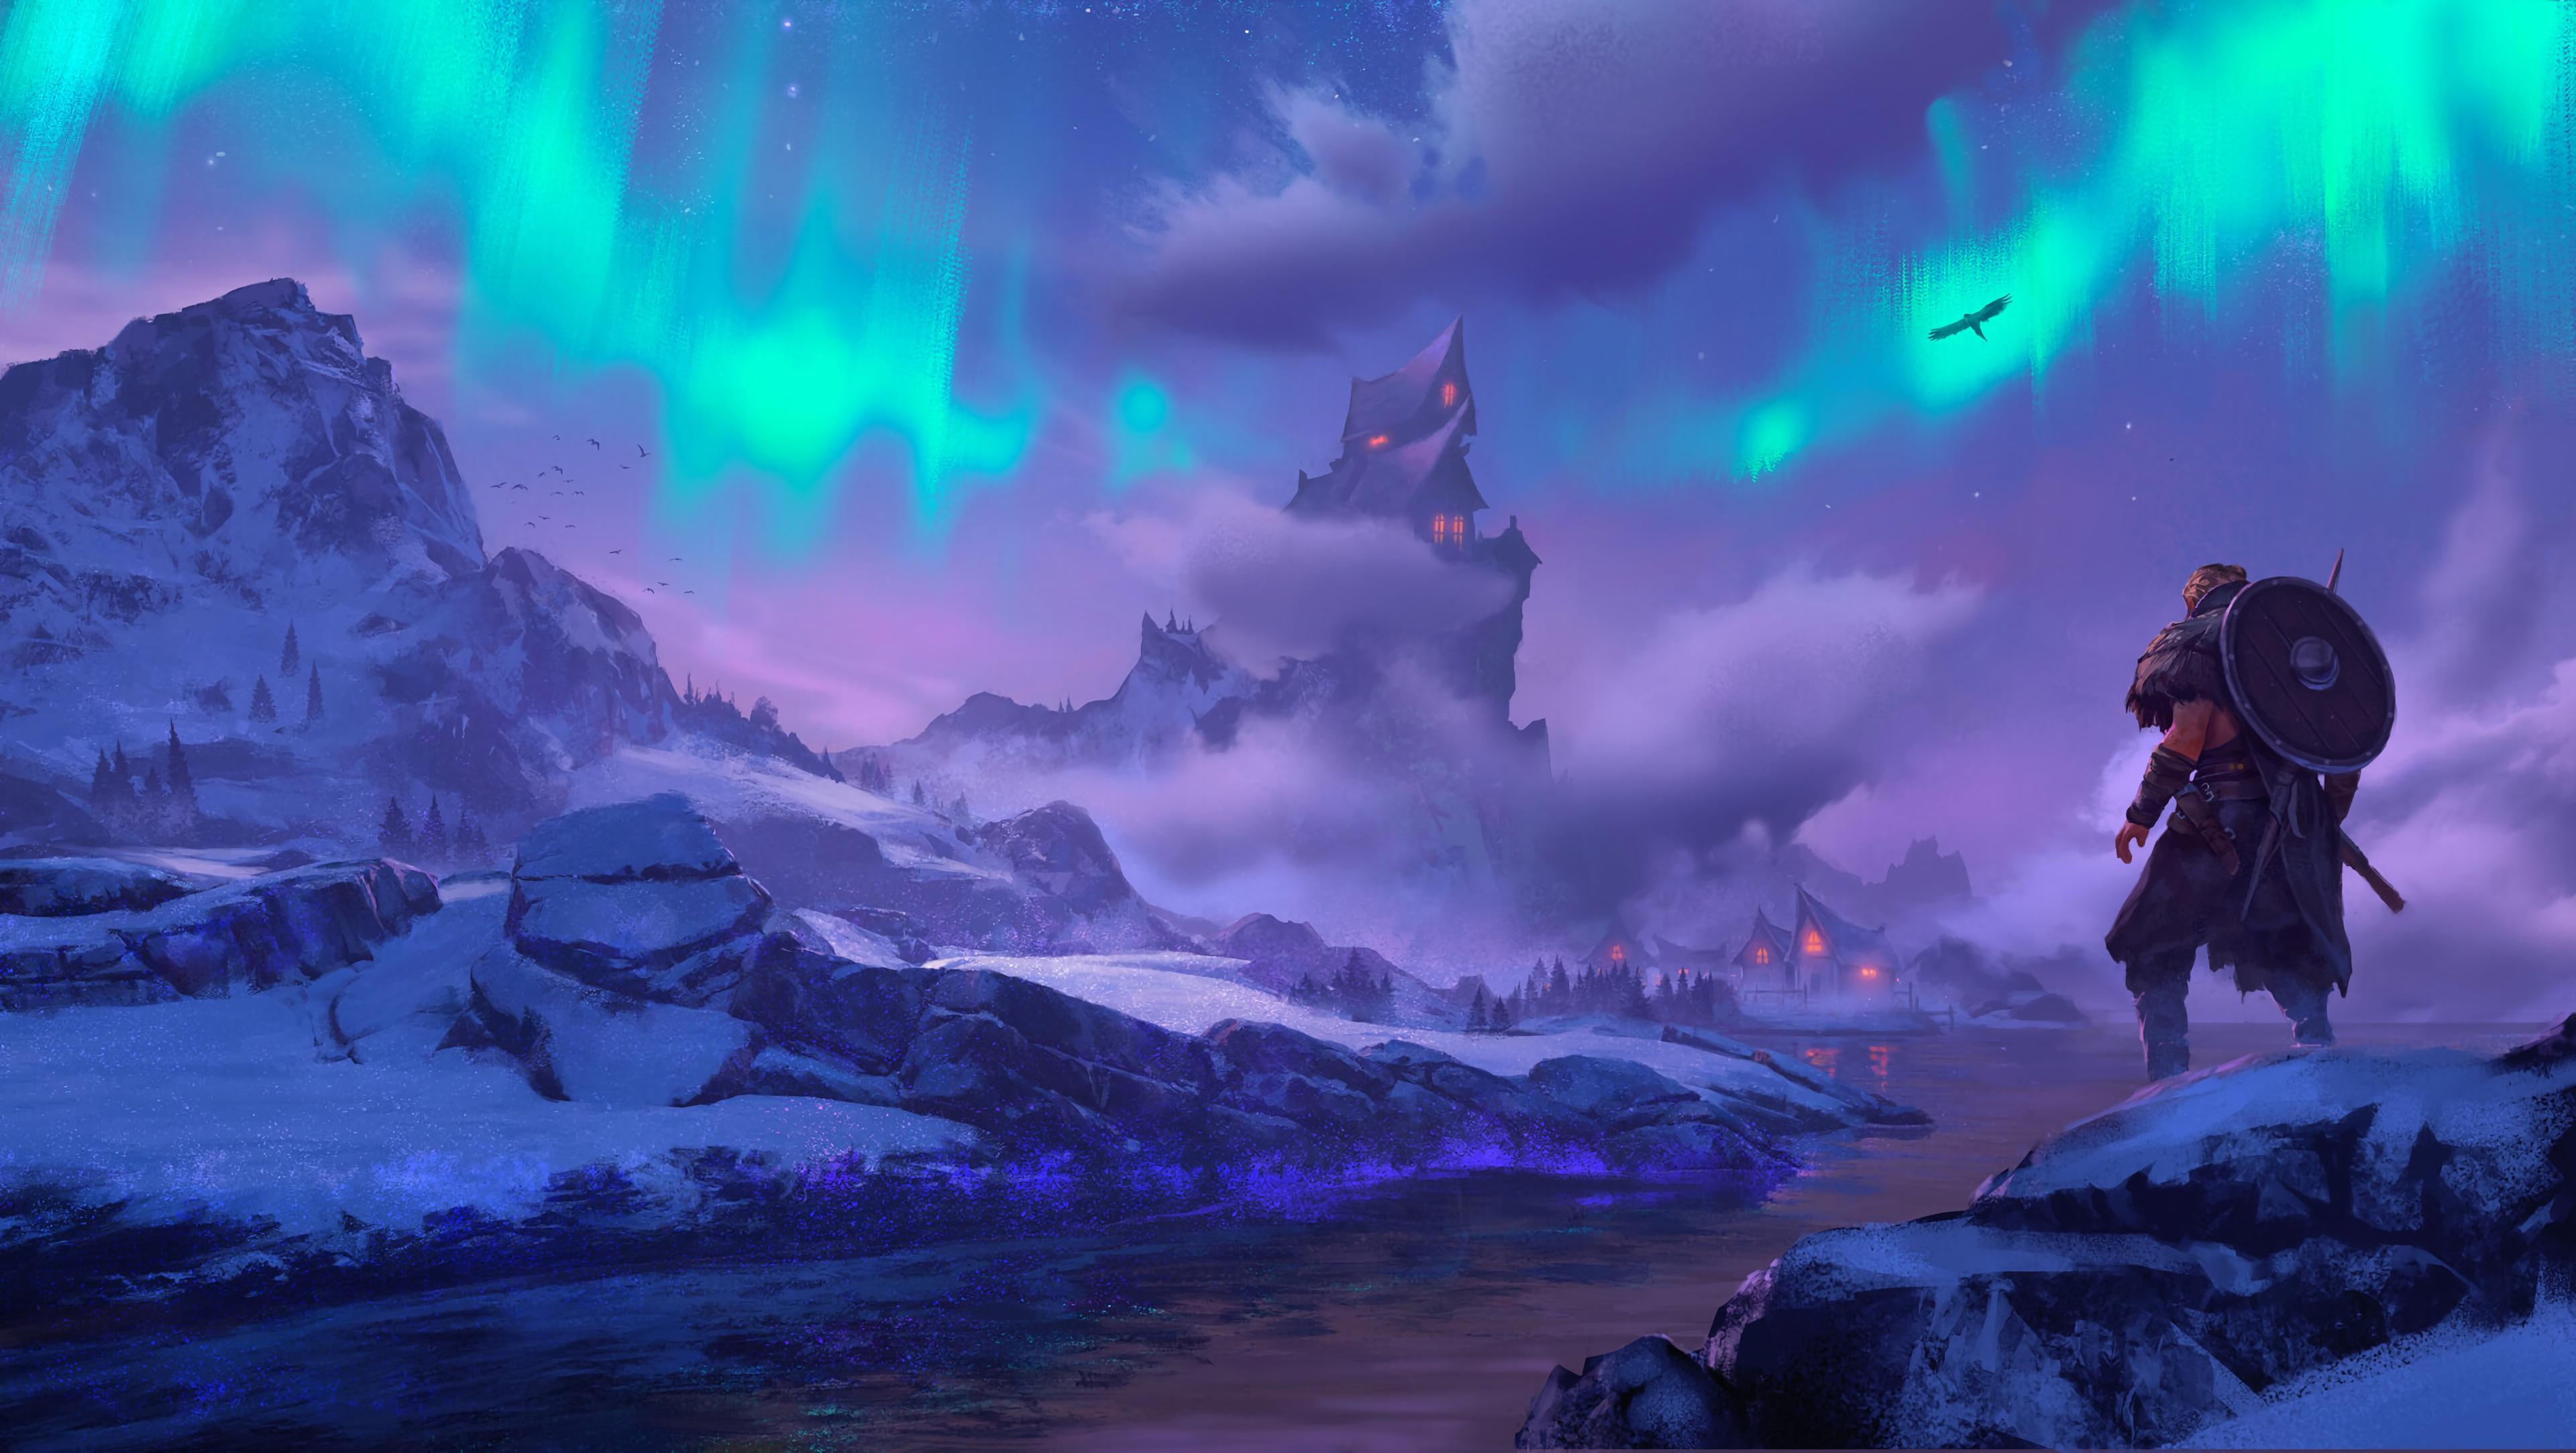 General 3840x2166 video games video game art digital art viking norse aurorae Assassin's Creed Assassin's Creed: Valhalla river birds